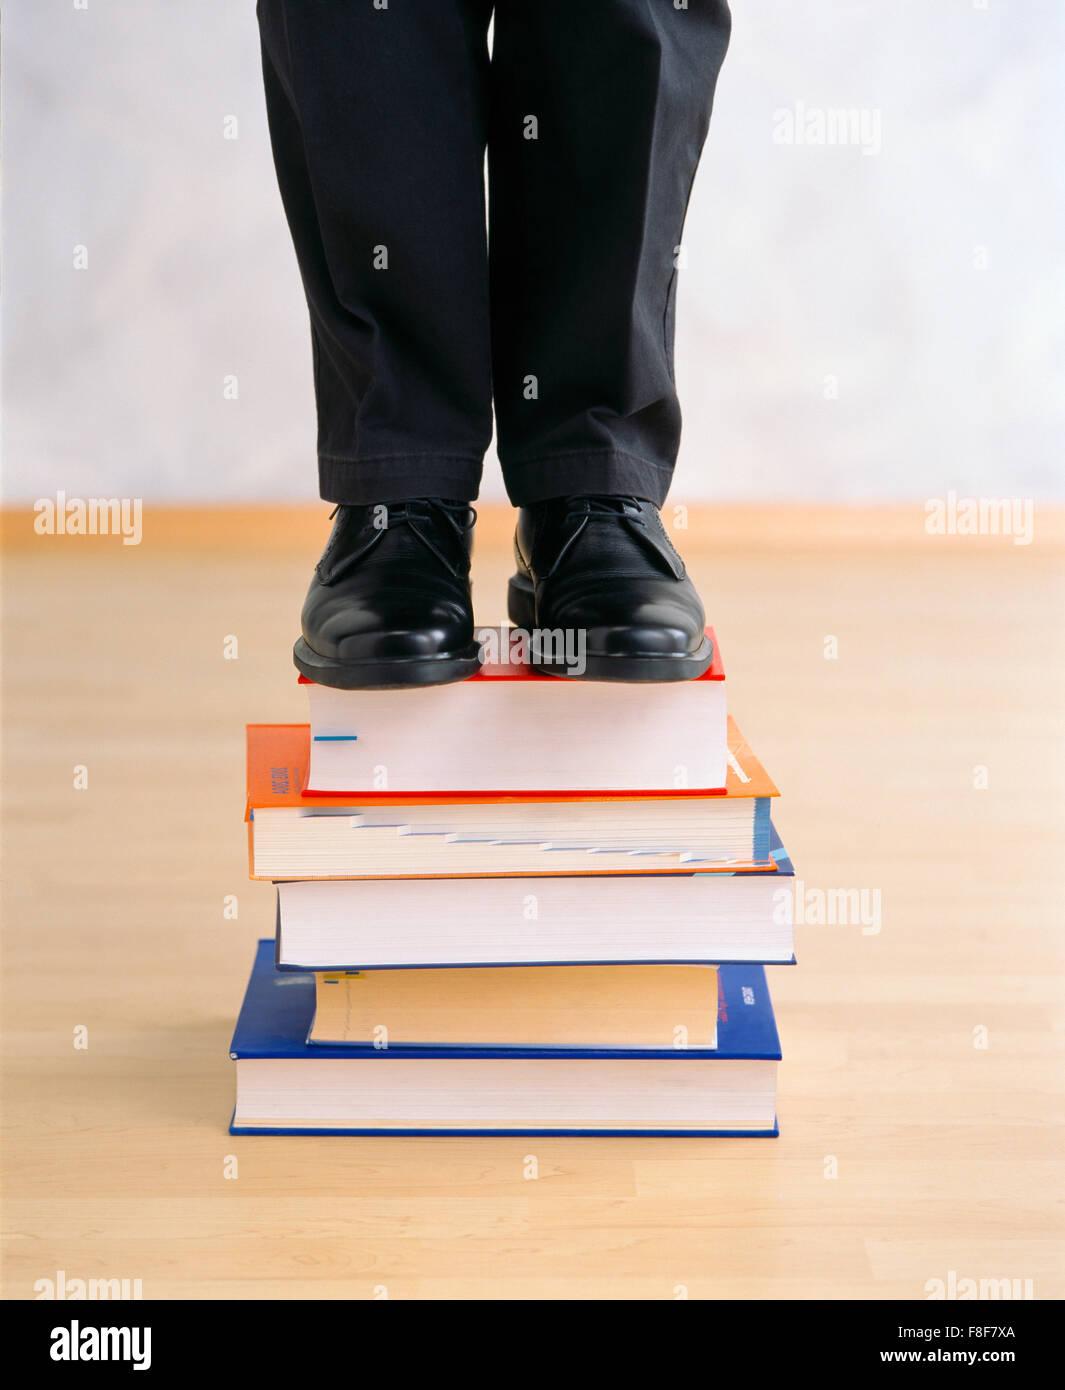 Mann auf einem bookpile Stockbild